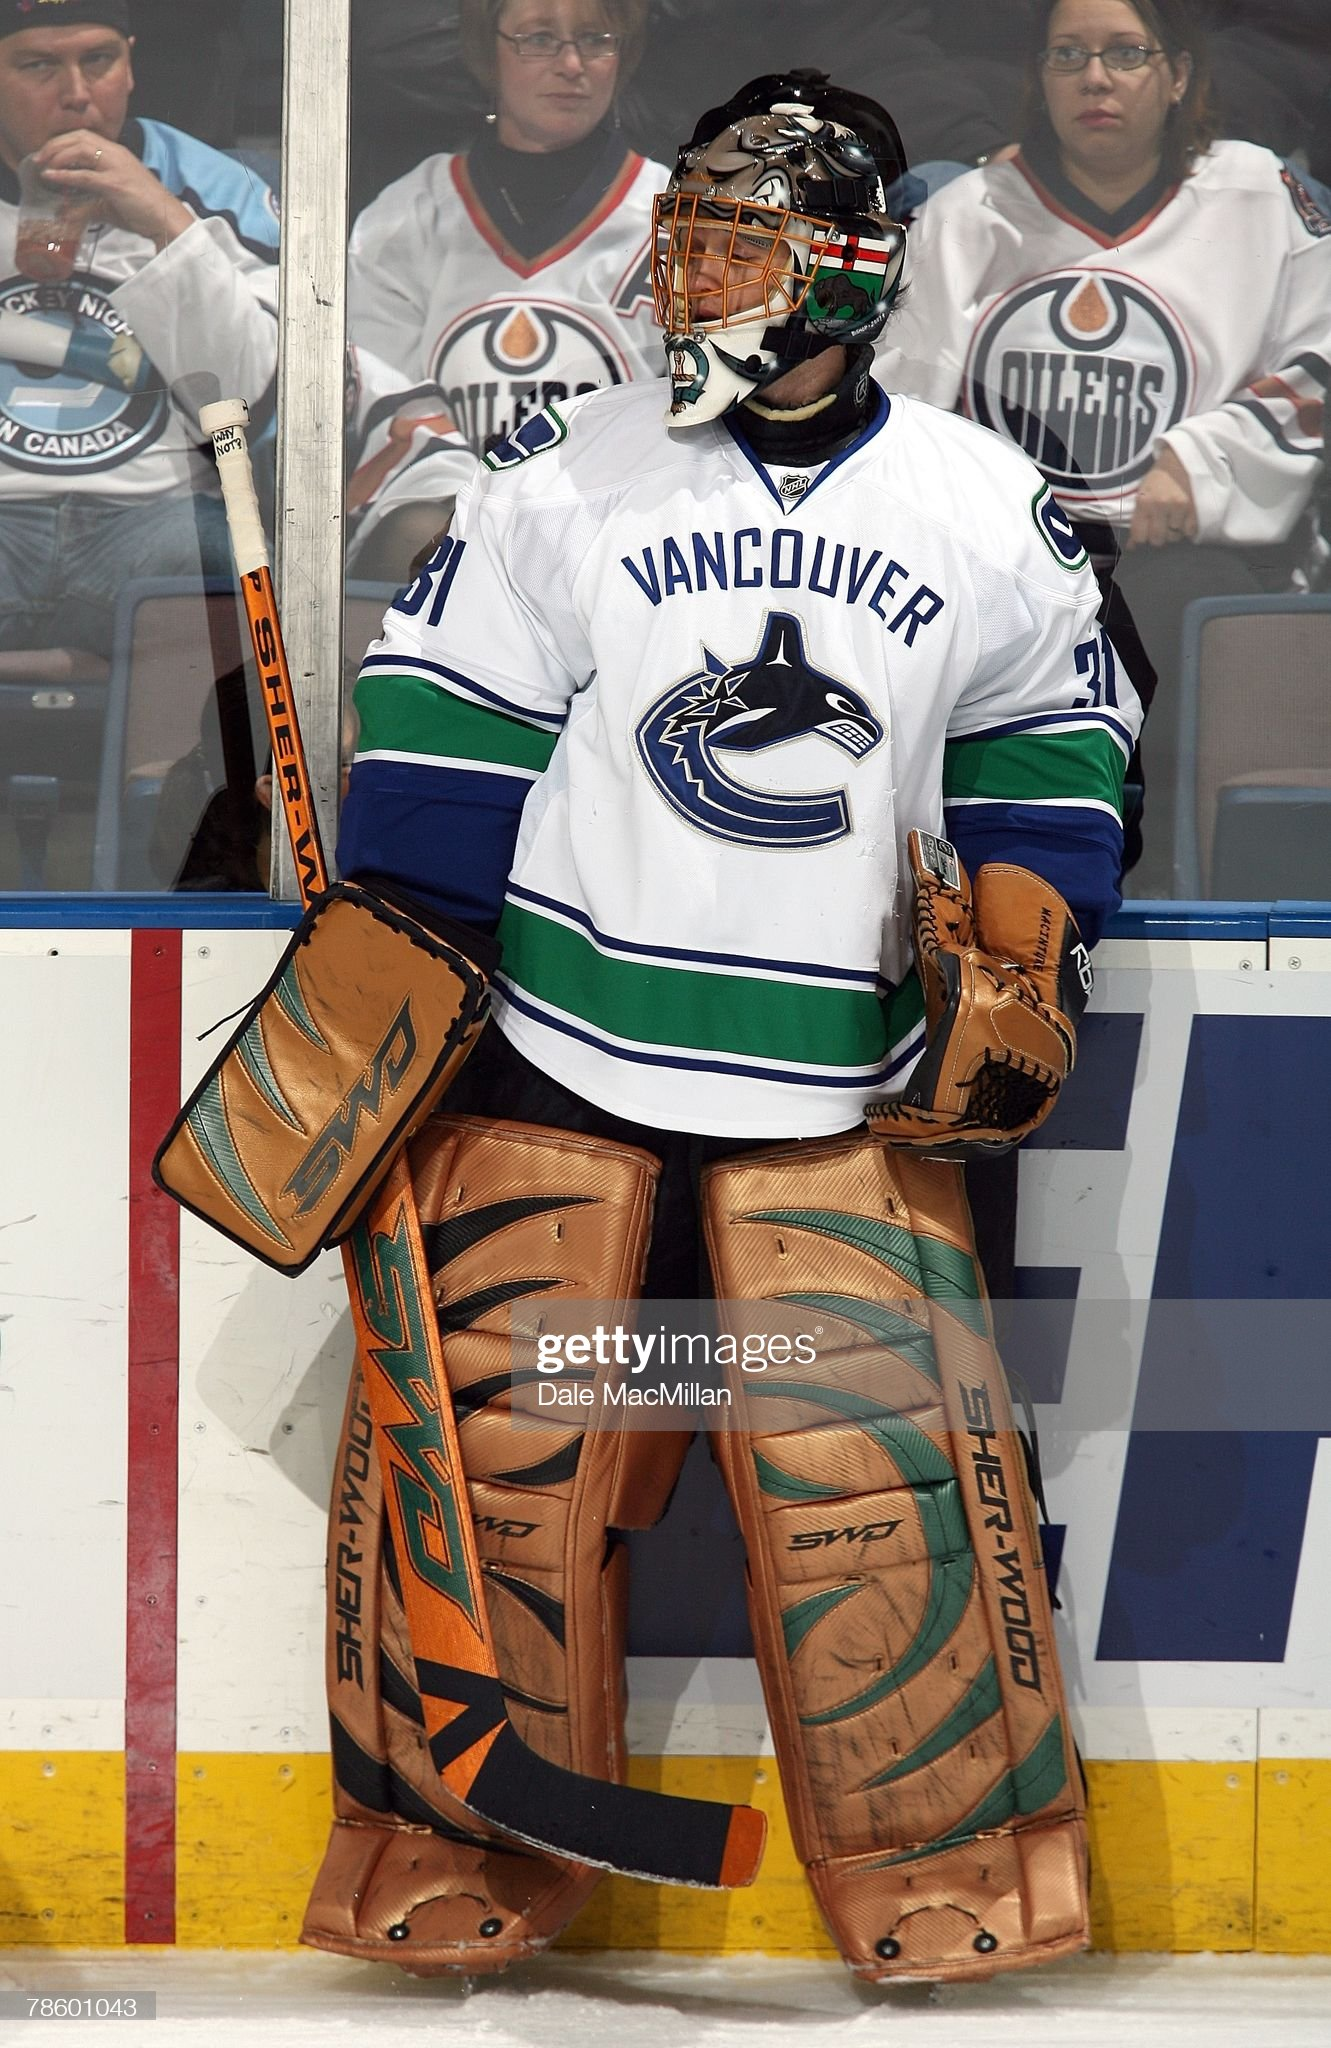 goaltender-drew-macintyre-of-the-vancouv